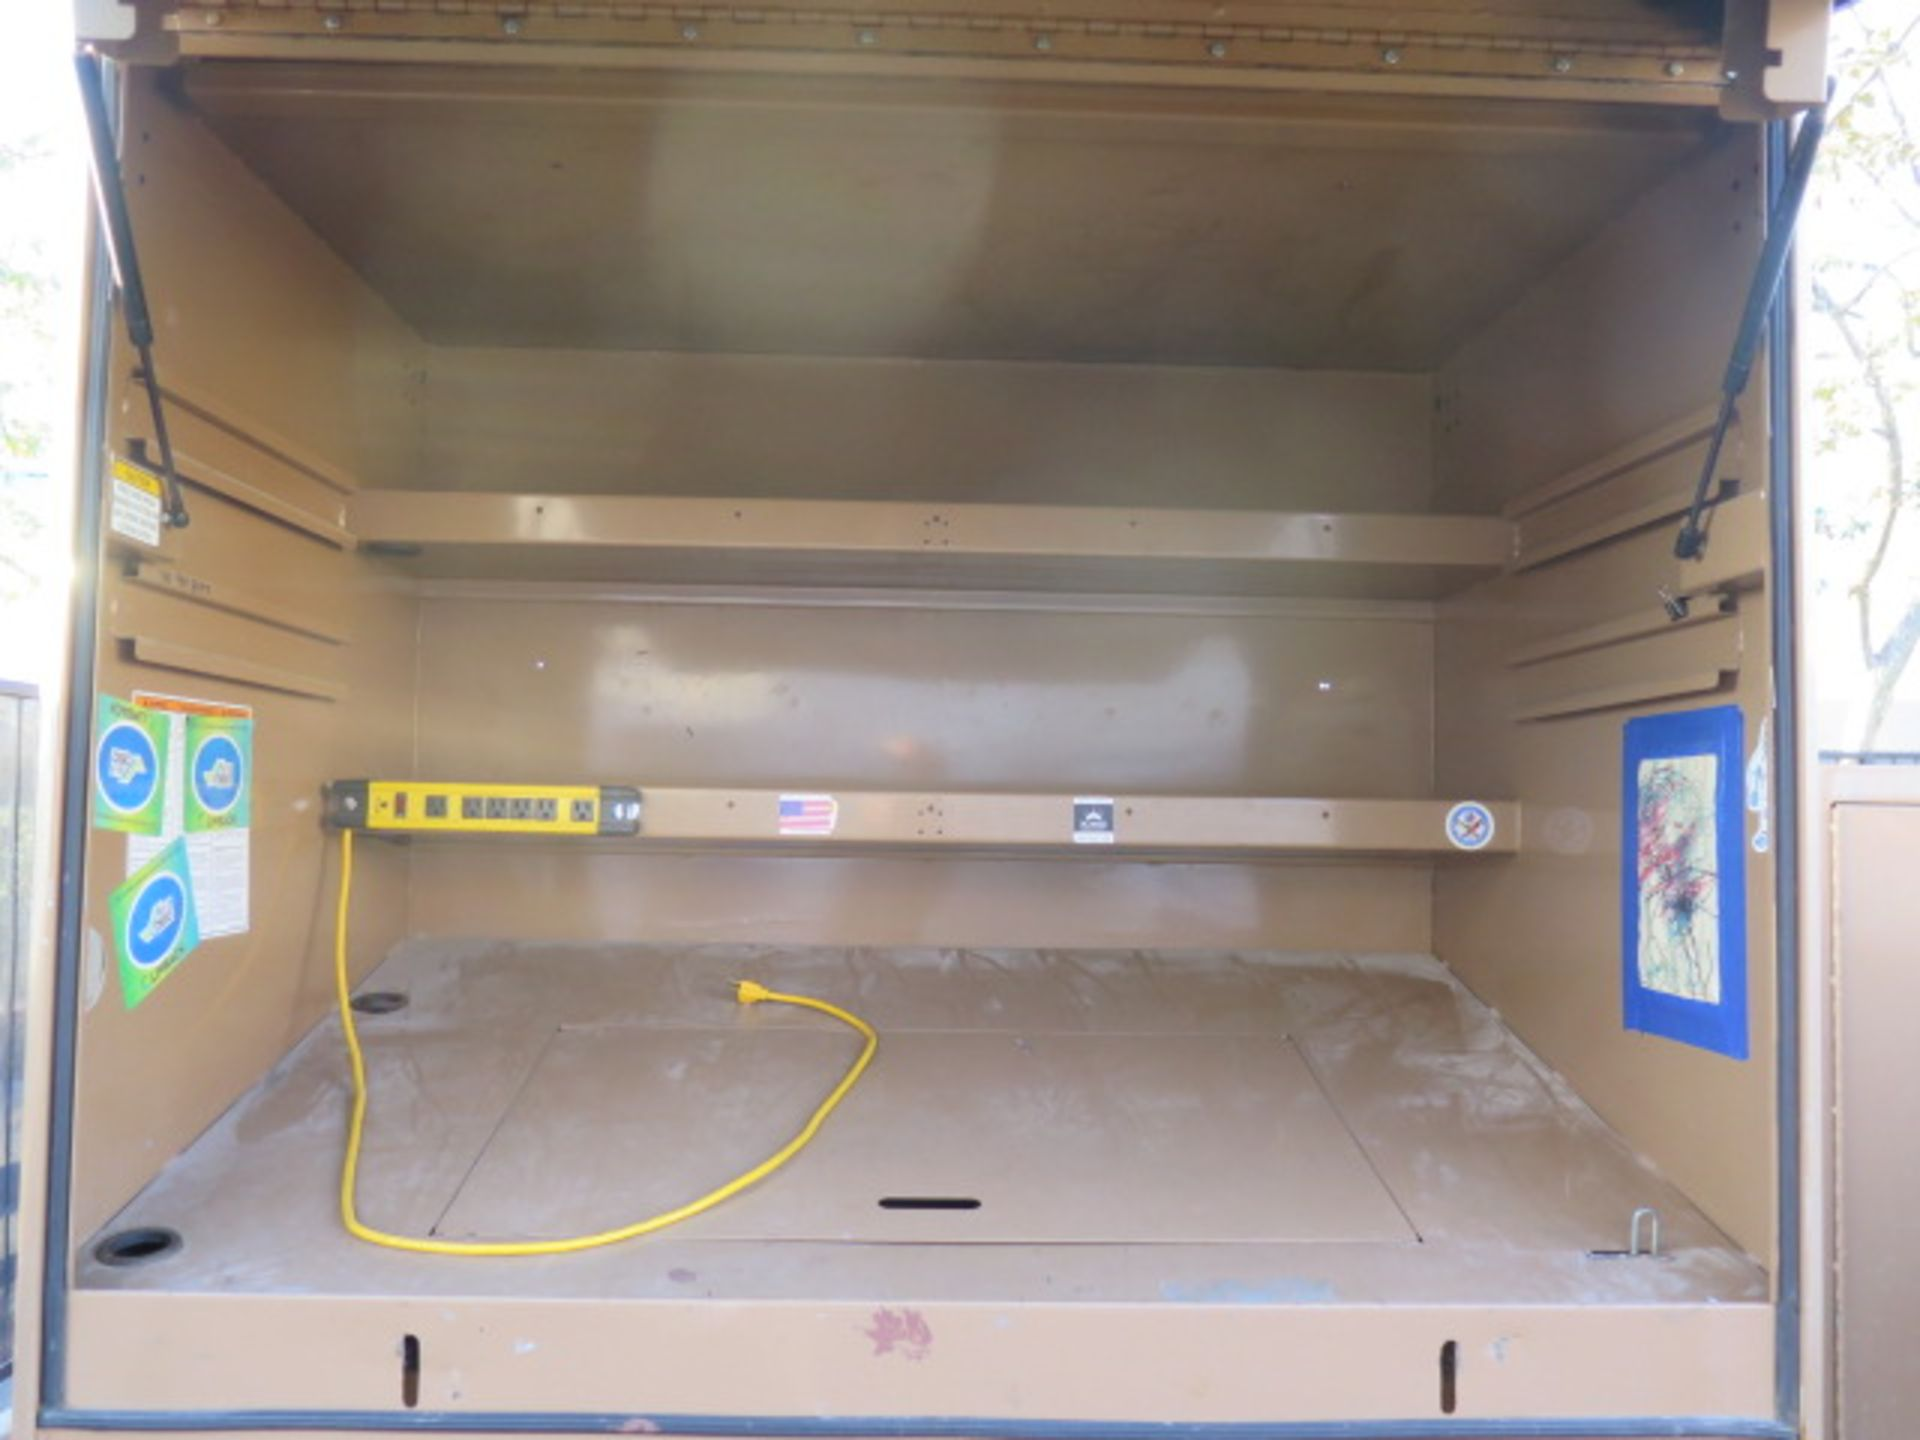 Knaack mdl. 119-01 Rolling Job Box (SOLD AS-IS - NO WARRANTY) - Image 5 of 7